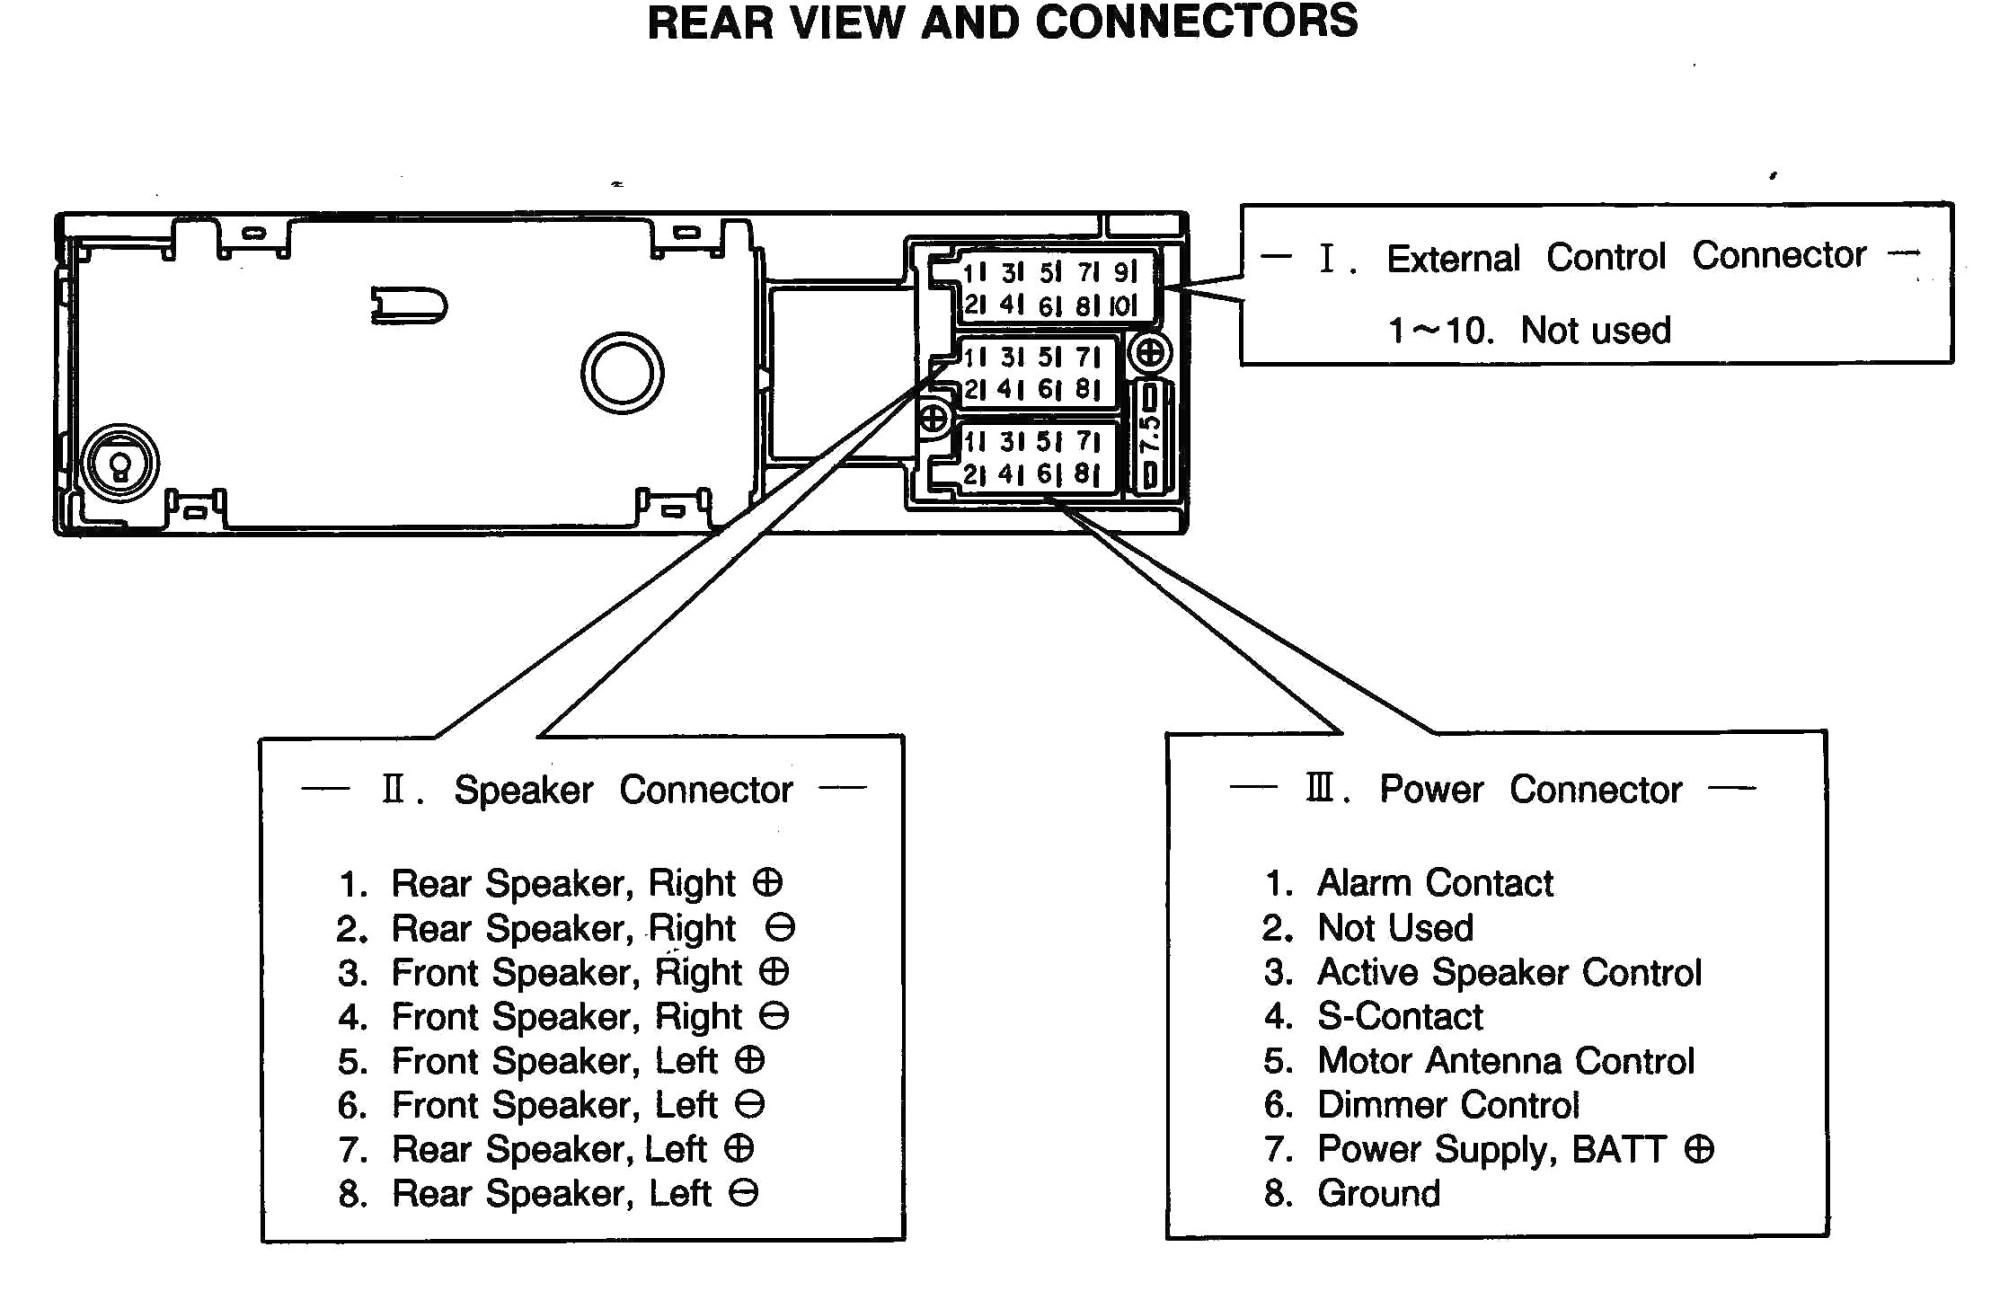 hight resolution of 2001 jetta ac diagram trusted wiring diagram rh dafpods co 95 jetta mk3 fuse diagram 95